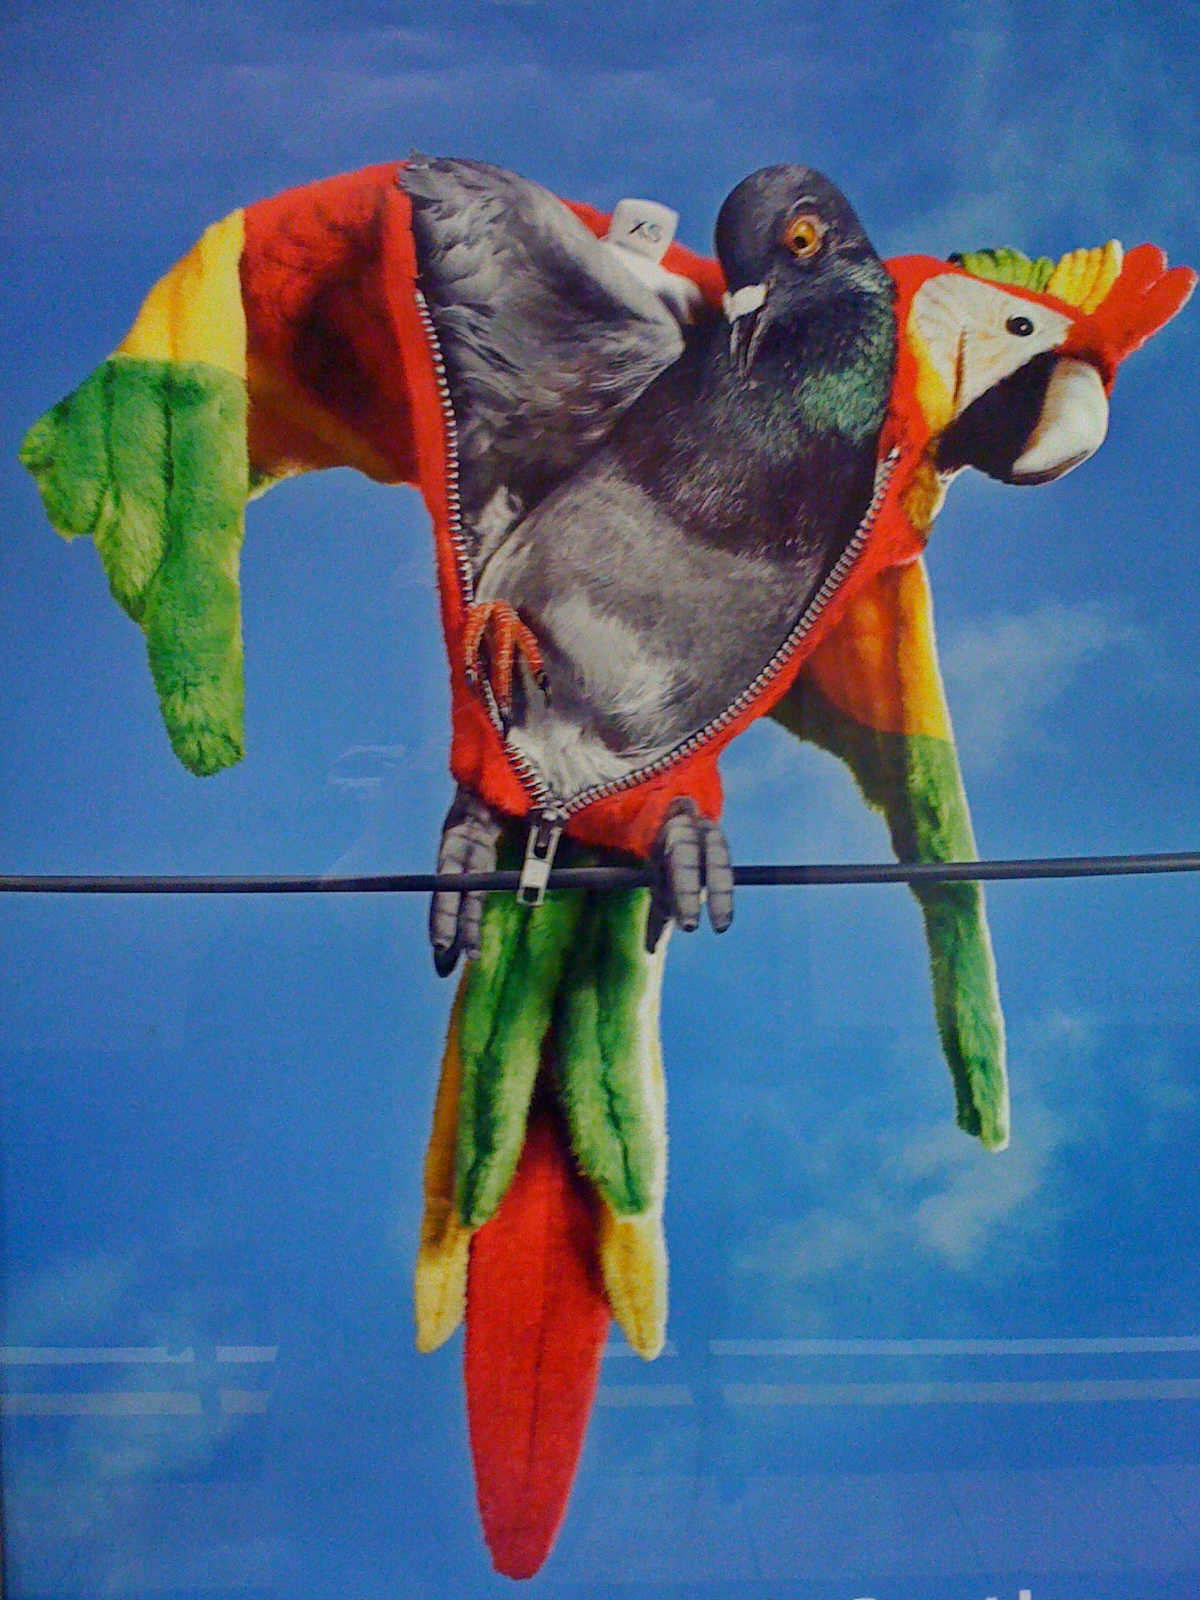 London Living: Carnival